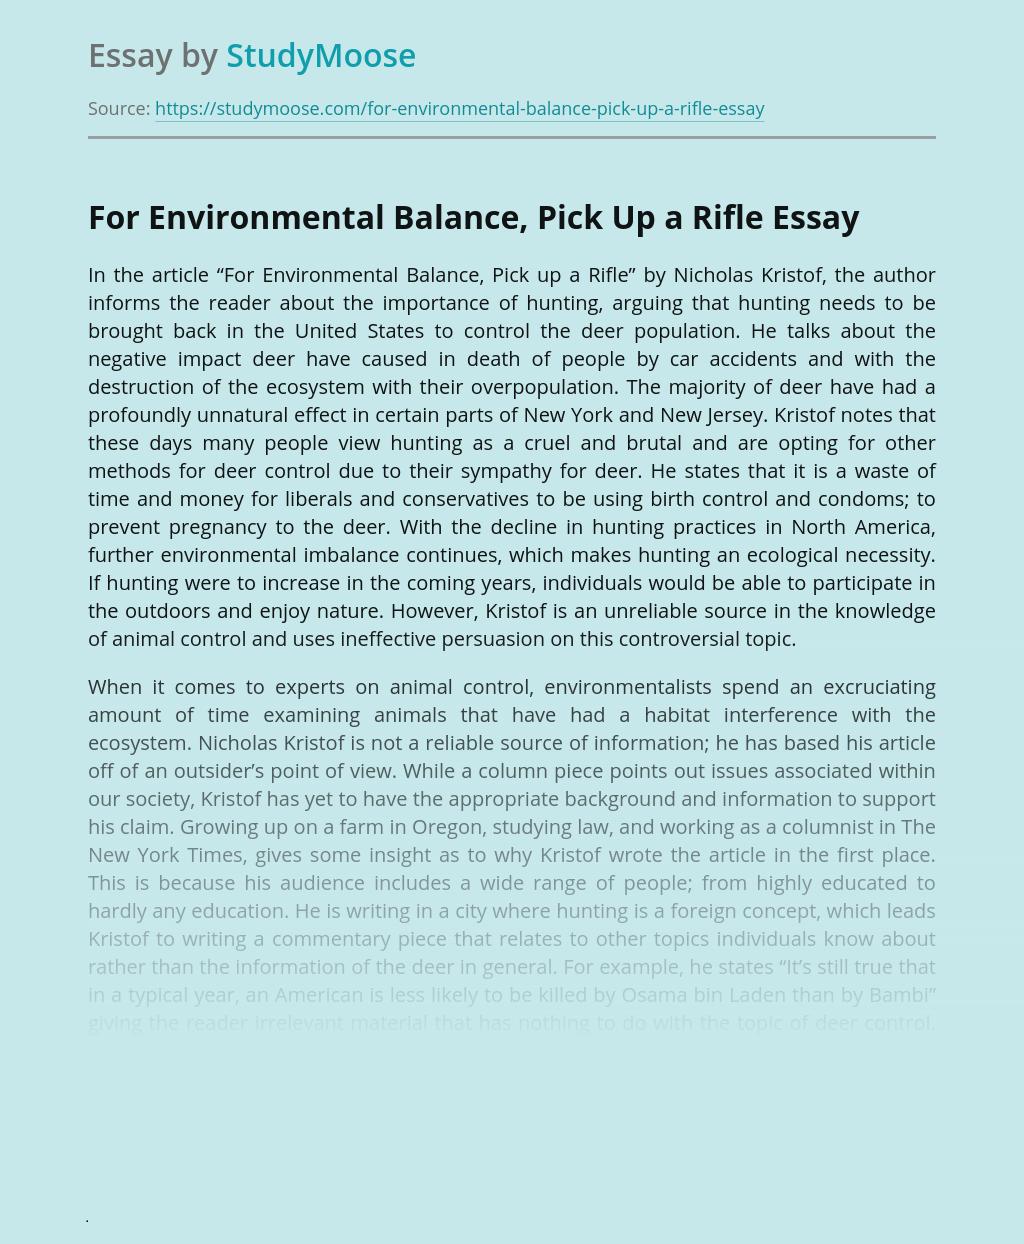 For Environmental Balance, Pick Up a Rifle